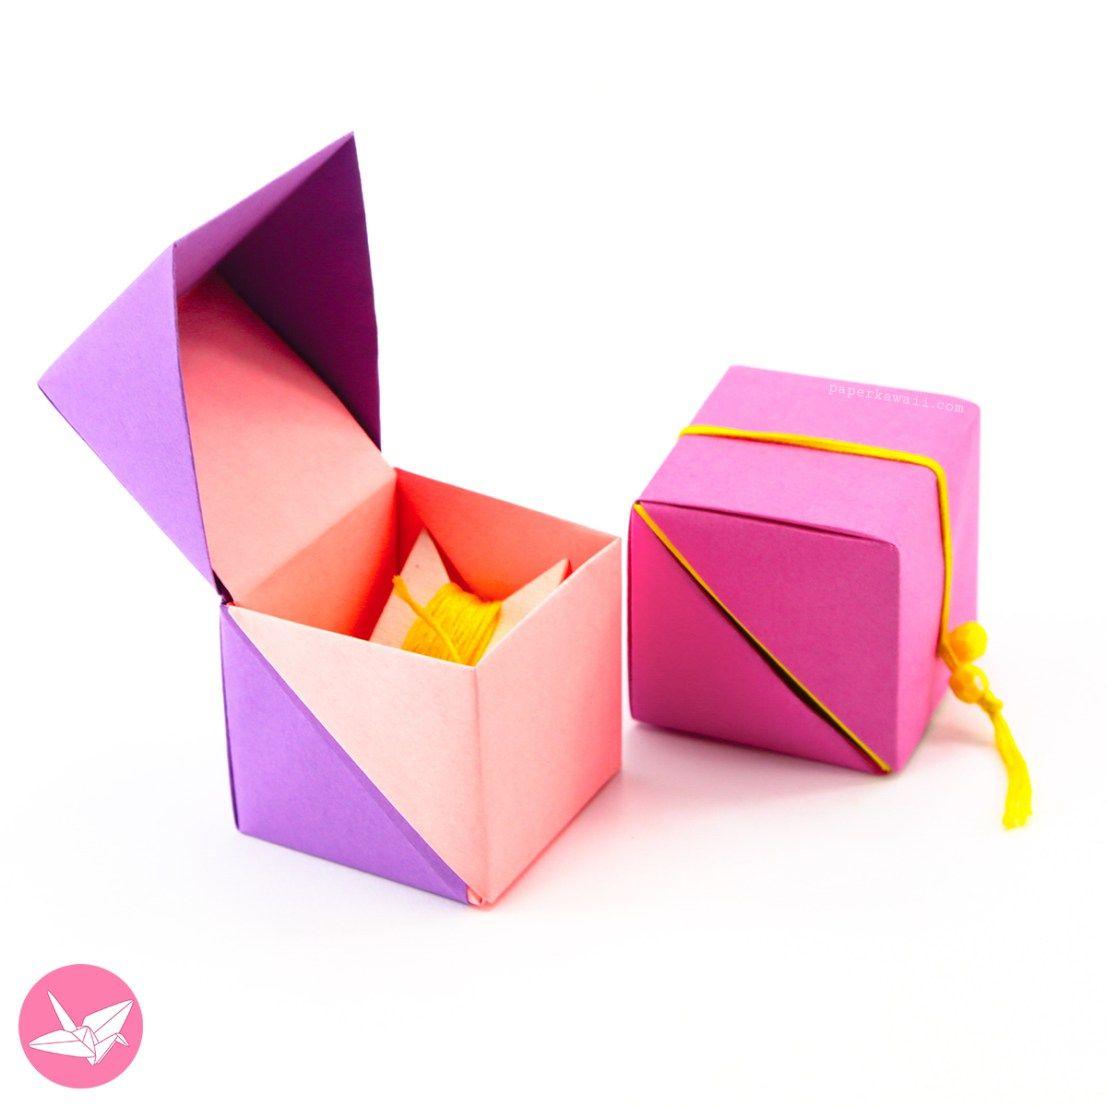 Origami Present Gift Box Tutorial - DIY - Paper Kawaii - YouTube | 1107x1107